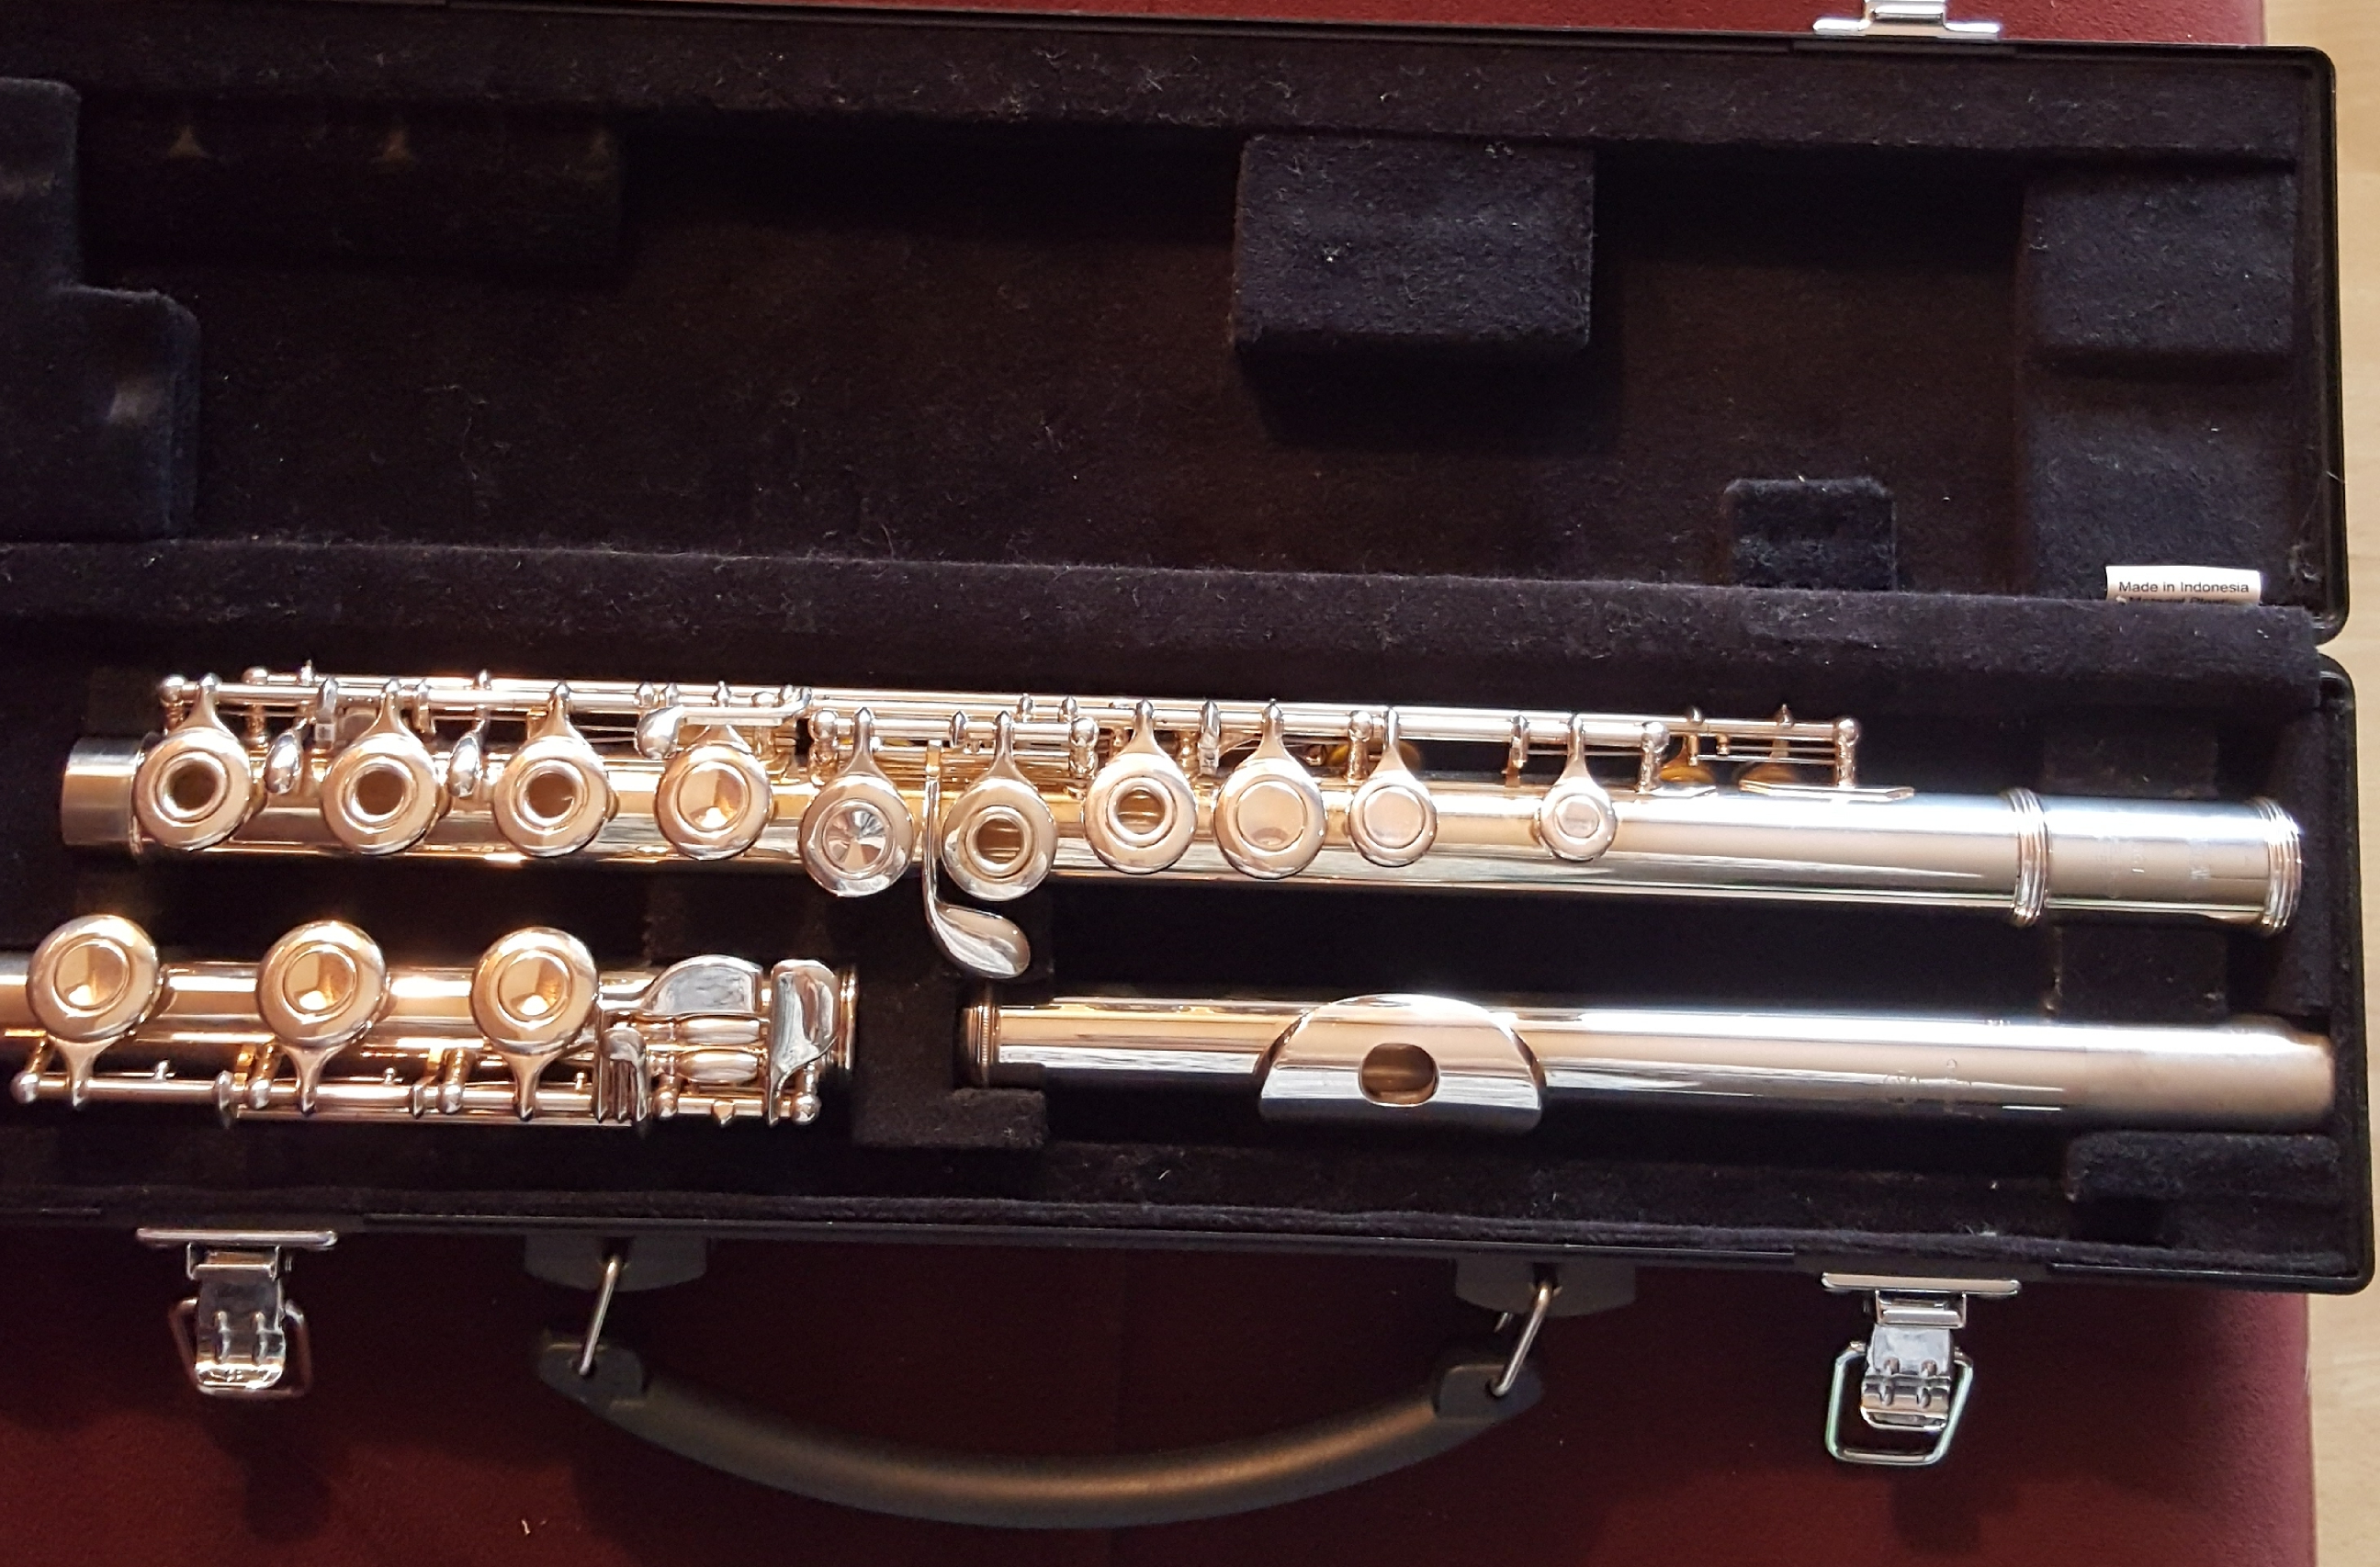 Yamaha flute 361 w/ Silver Head 925